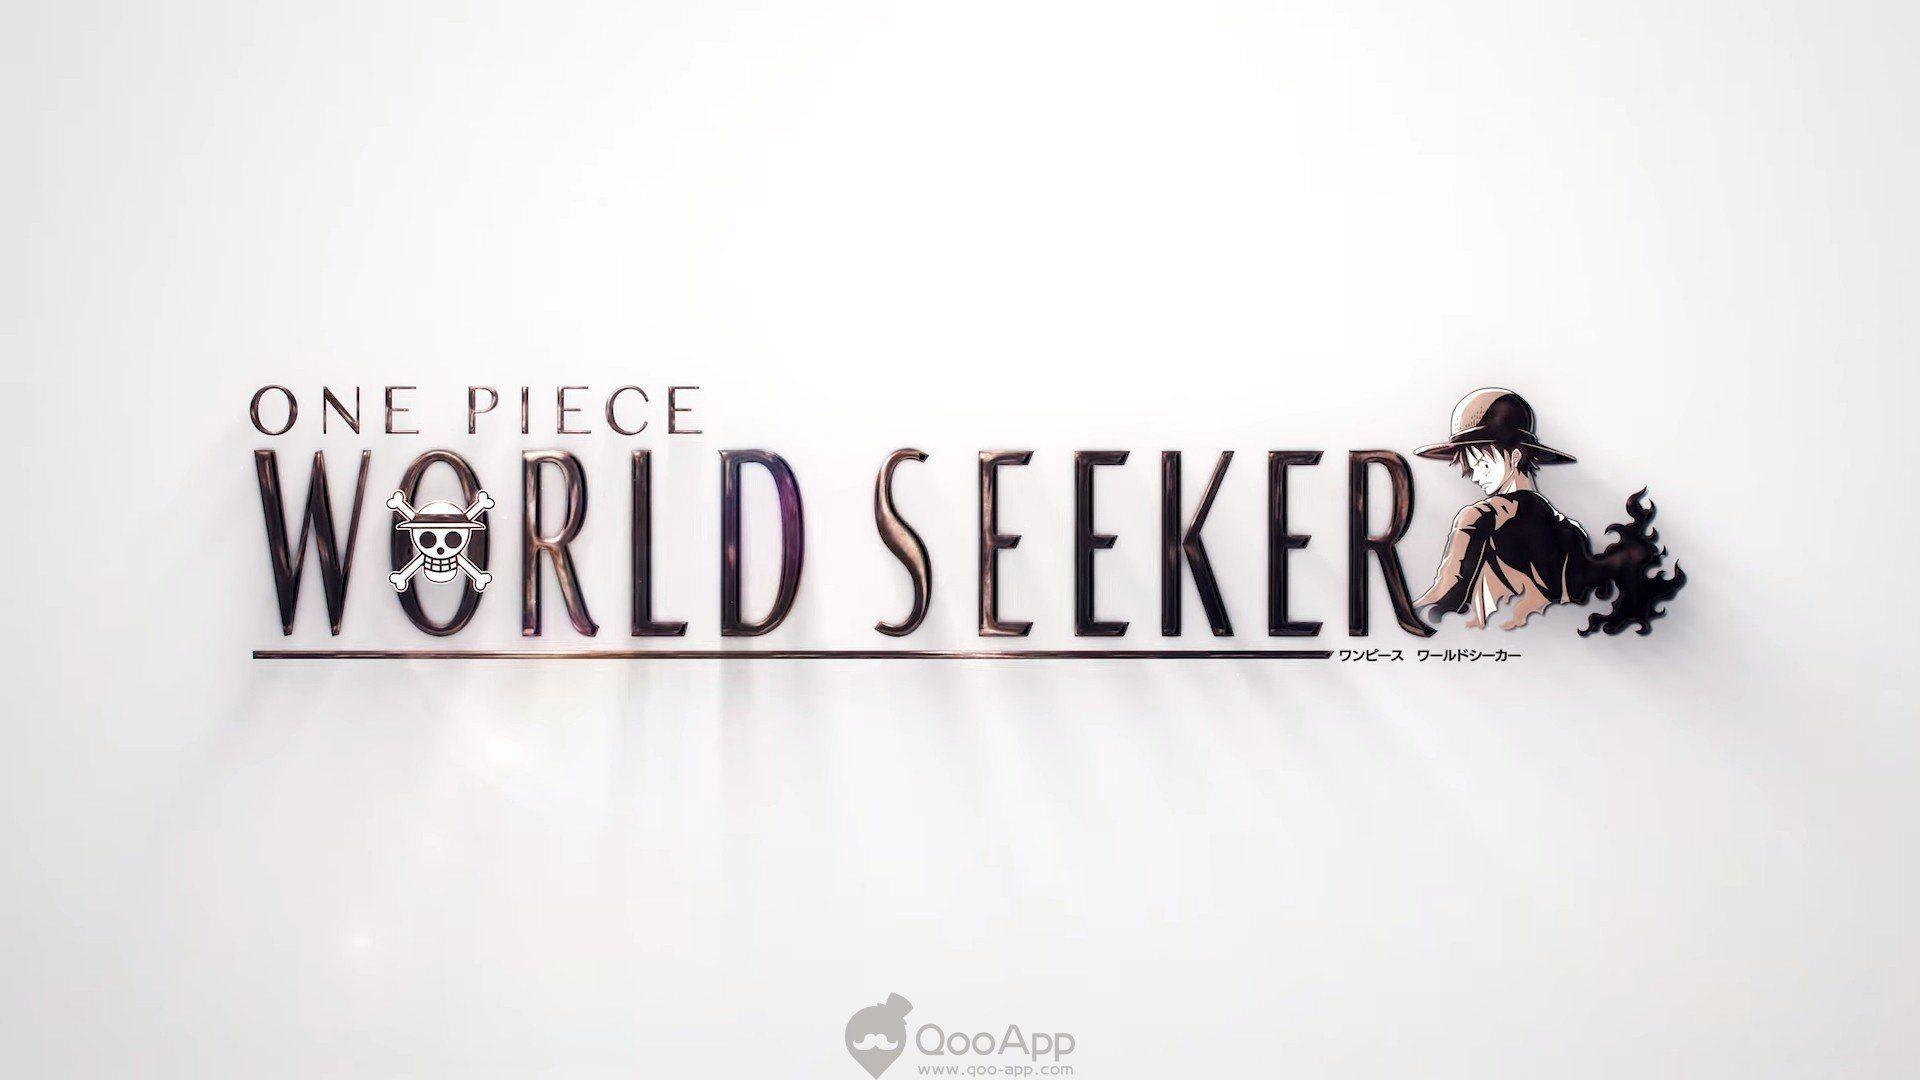 One Piece: World Seeker Wallpapers - Wallpaper Cave